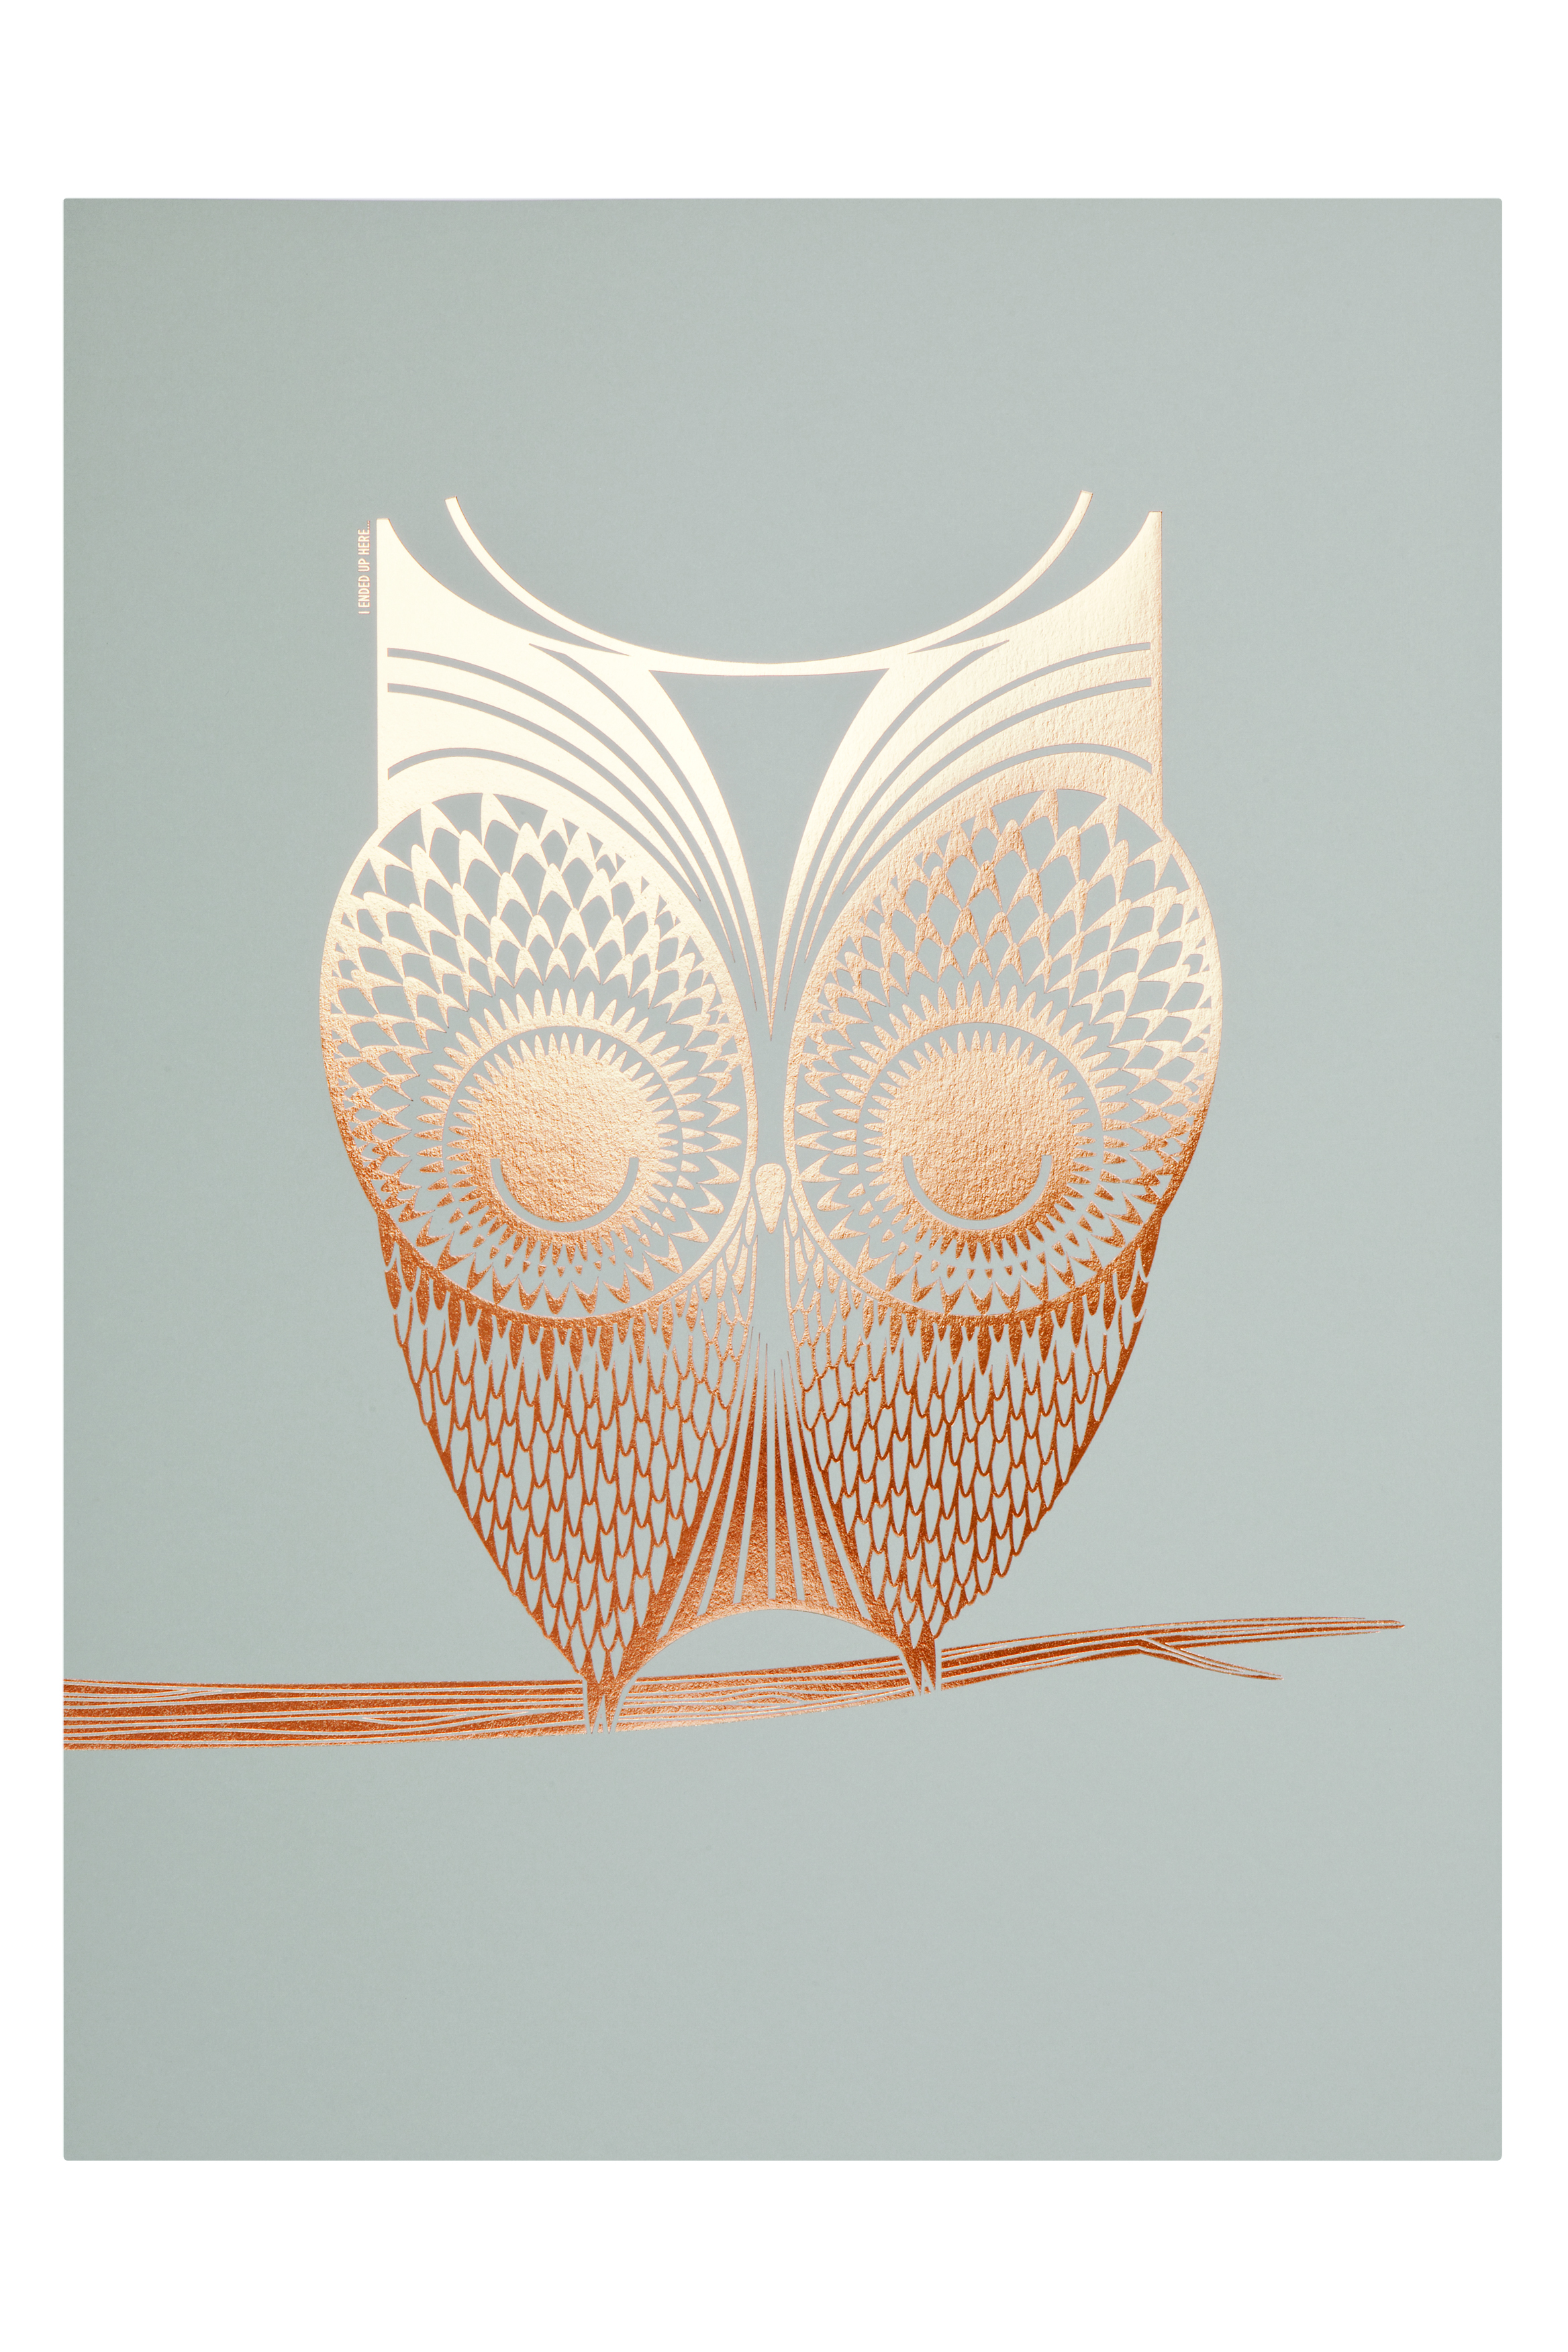 Foil owl artprint on smoke